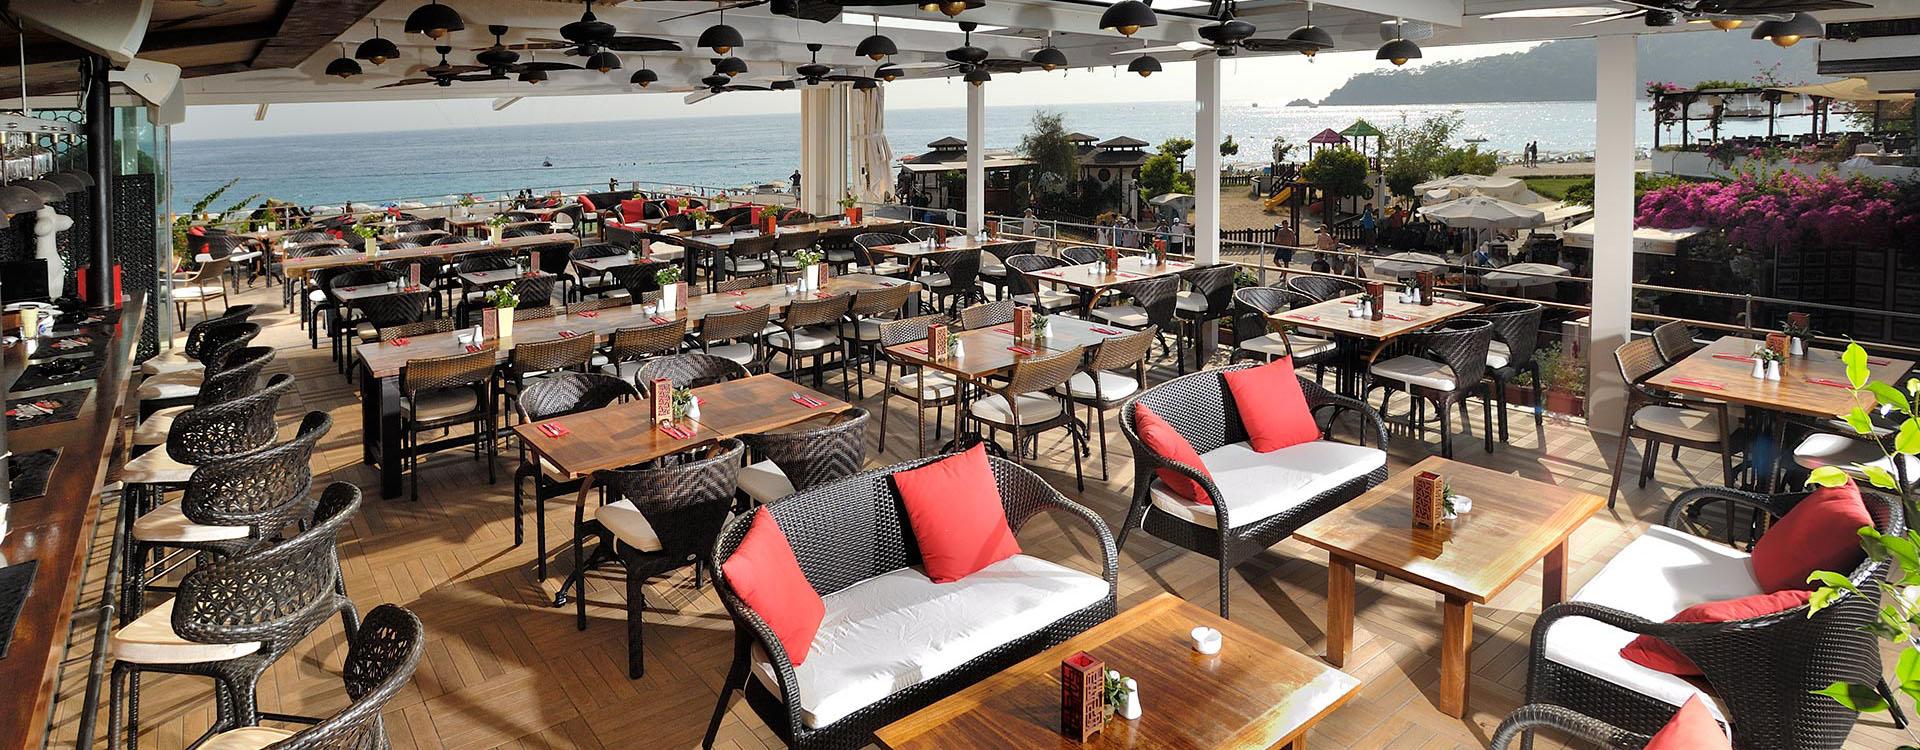 Hangout Restaurant Oludeniz Turkey